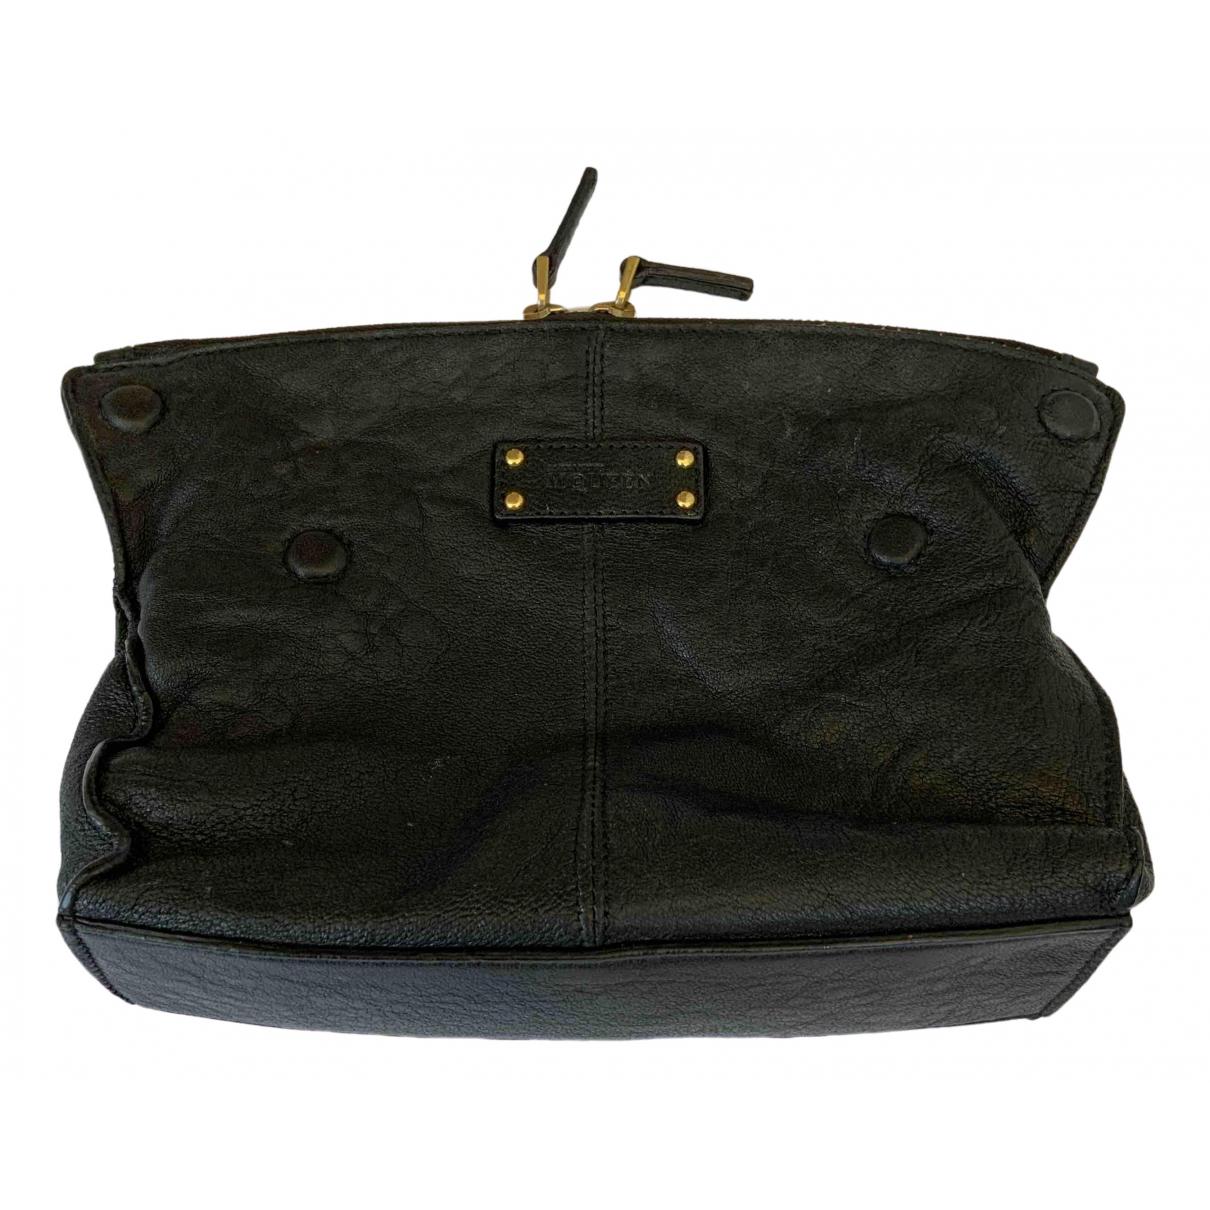 Alexander Mcqueen Manta Black Leather Clutch bag for Women \N